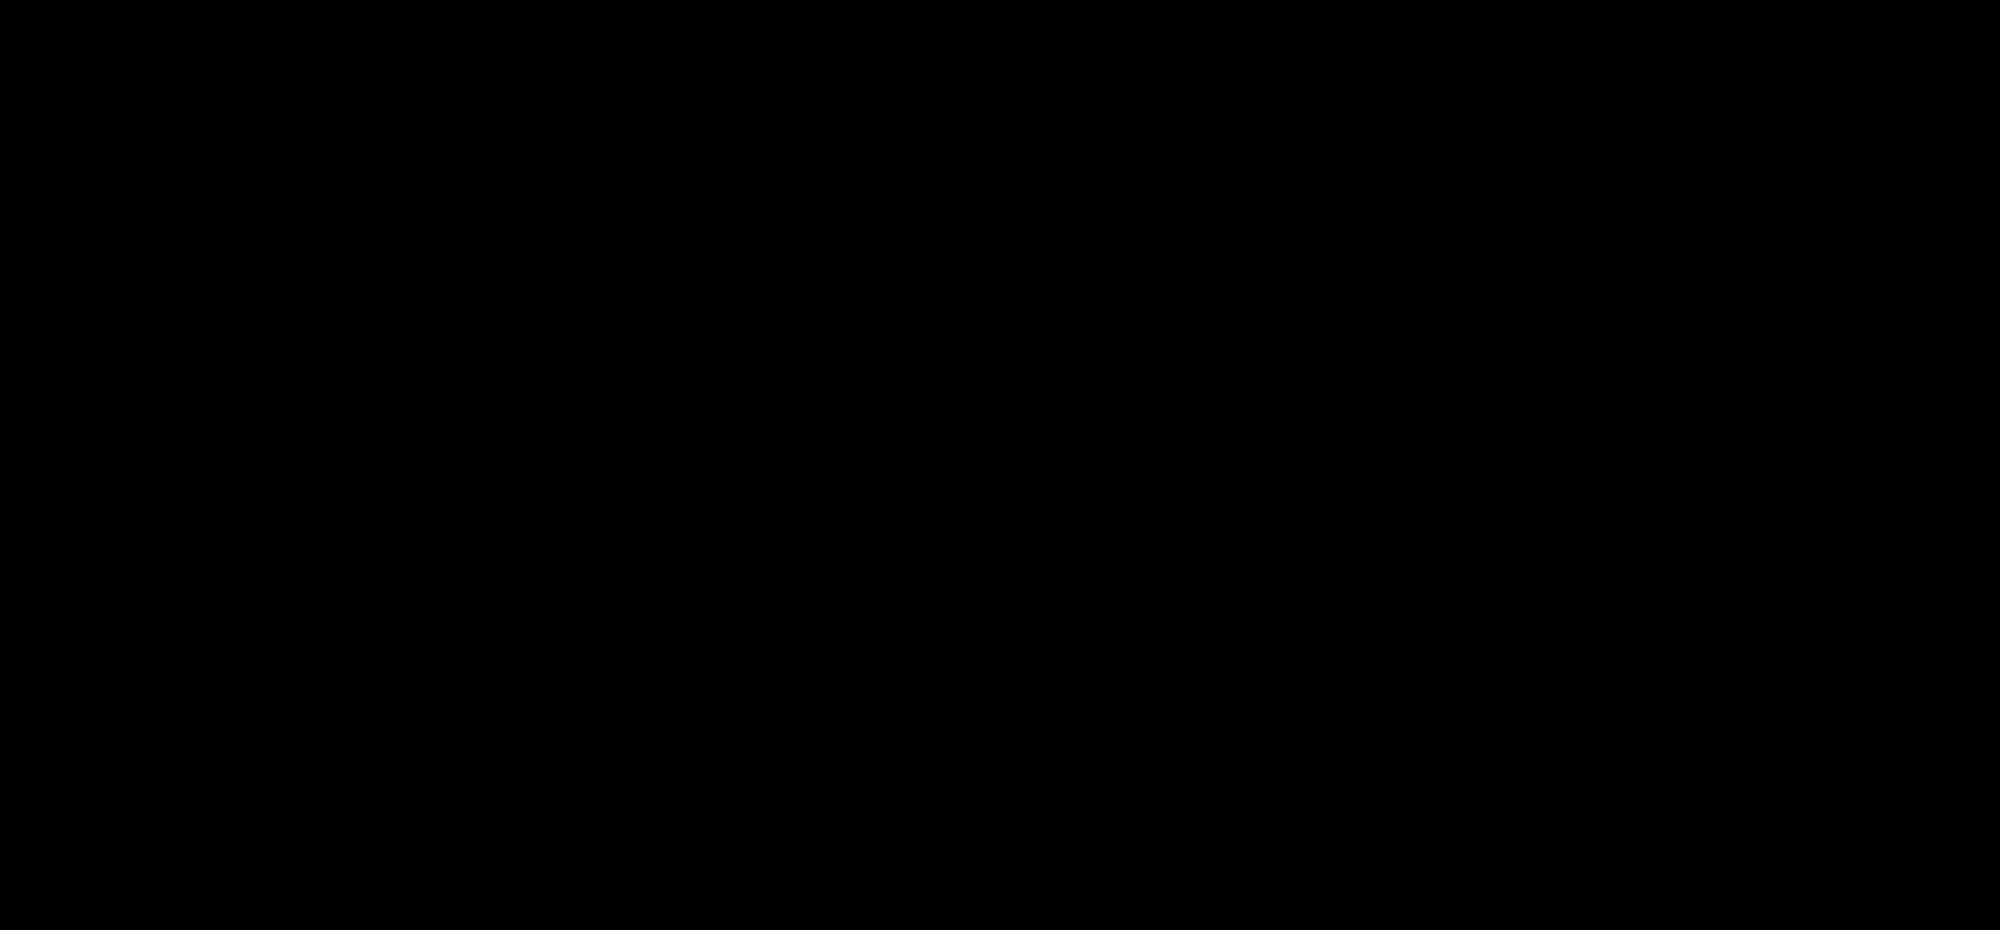 TECH TALENT HUB-logo-black (2).png